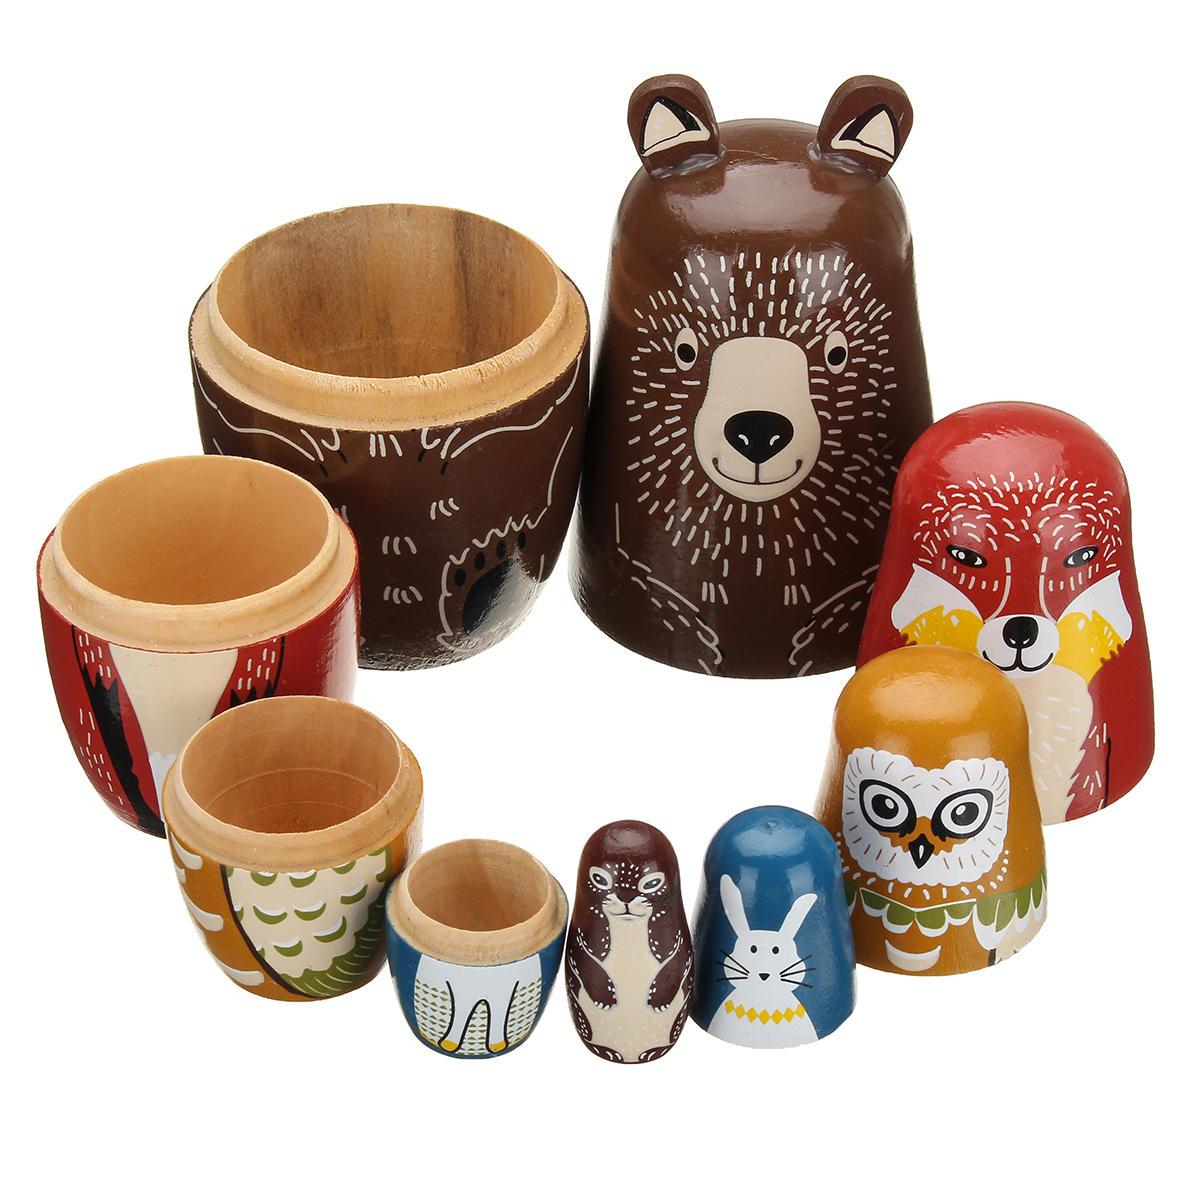 5 Nesting Dolls Wooden Aniimal Bear Russian Doll Matryoshka Toy Decor Kid Gift